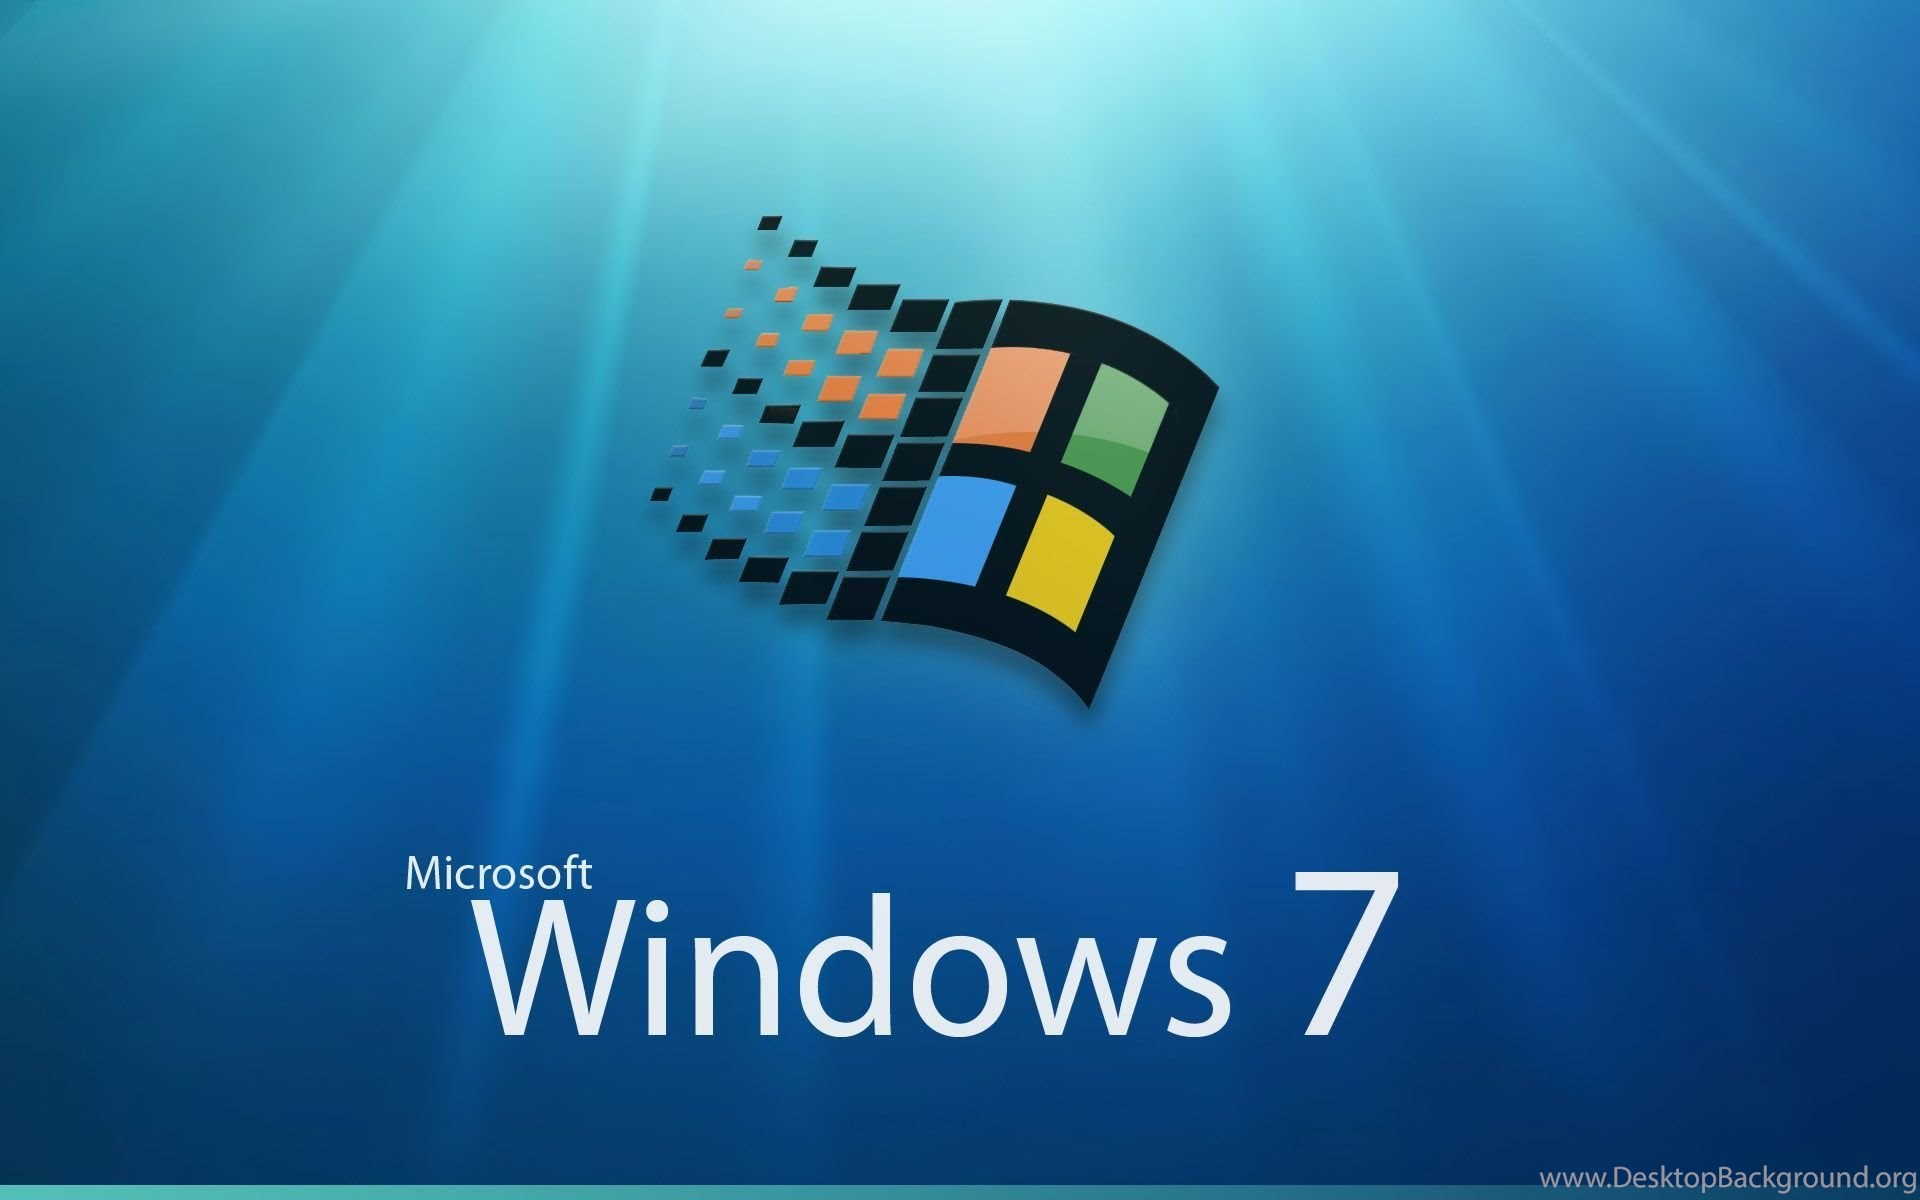 windows 7 wallpapers hd wallpapers 160306 desktop background